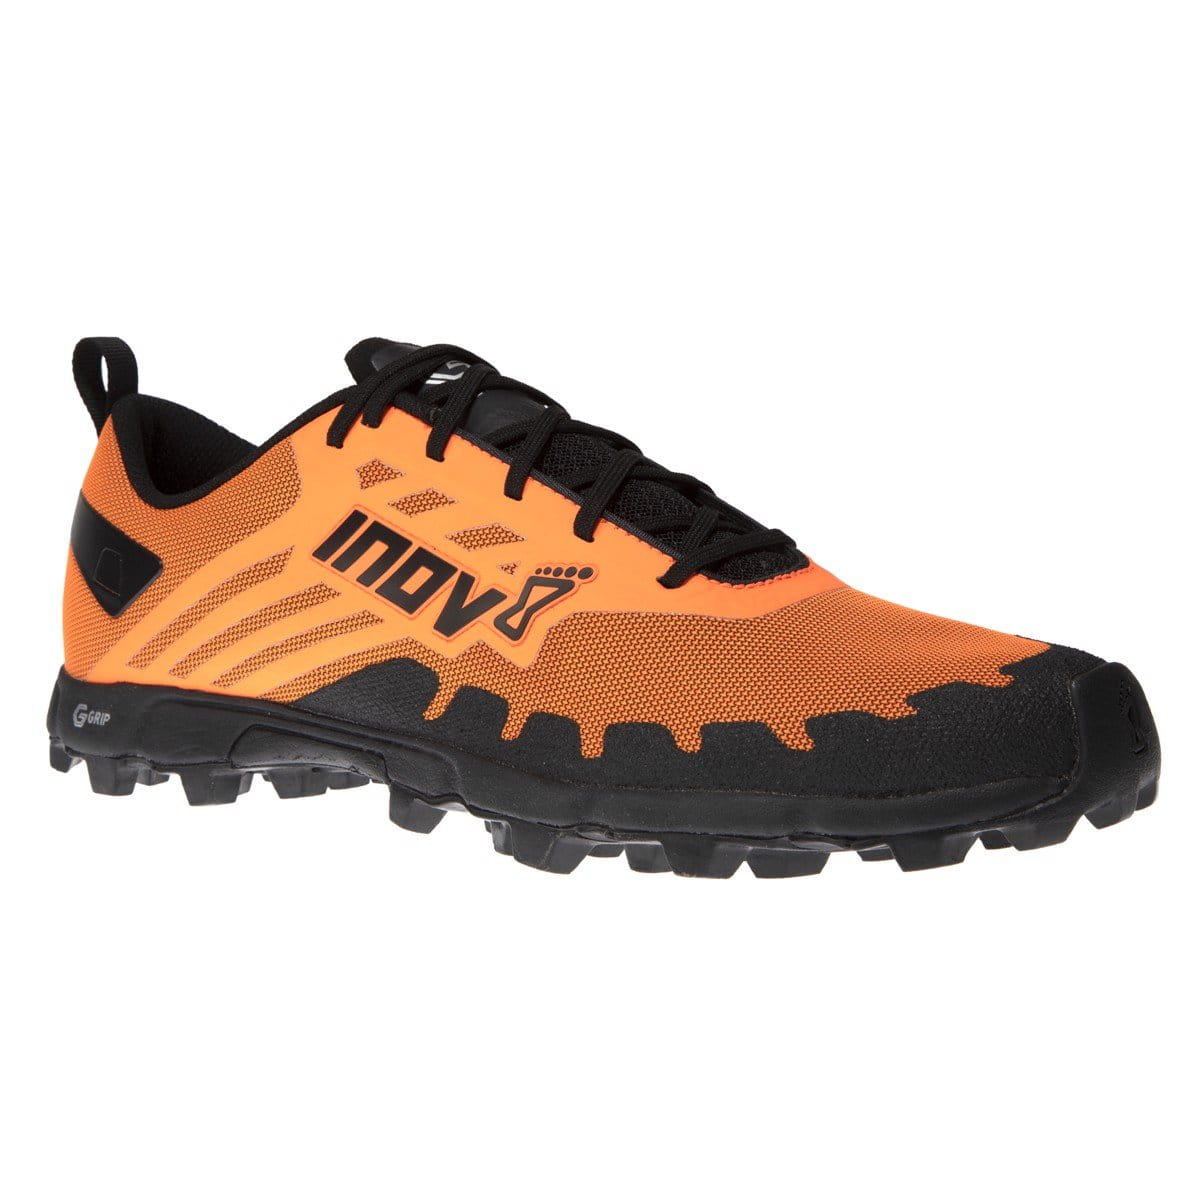 Běžecká obuv Inov-8  X-TALON G 235 W (P) orange/black oranžová/černá